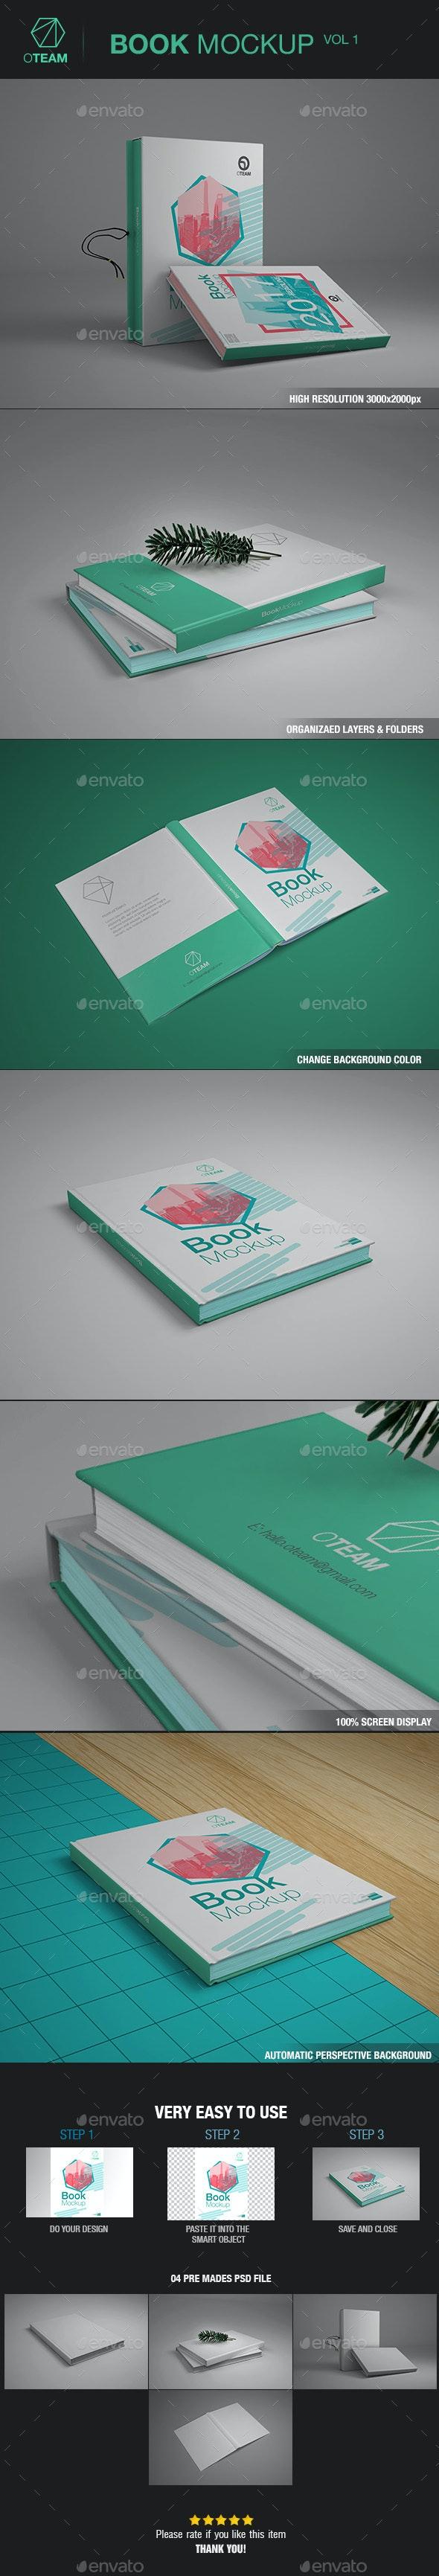 Books Mockup - Product Mock-Ups Graphics